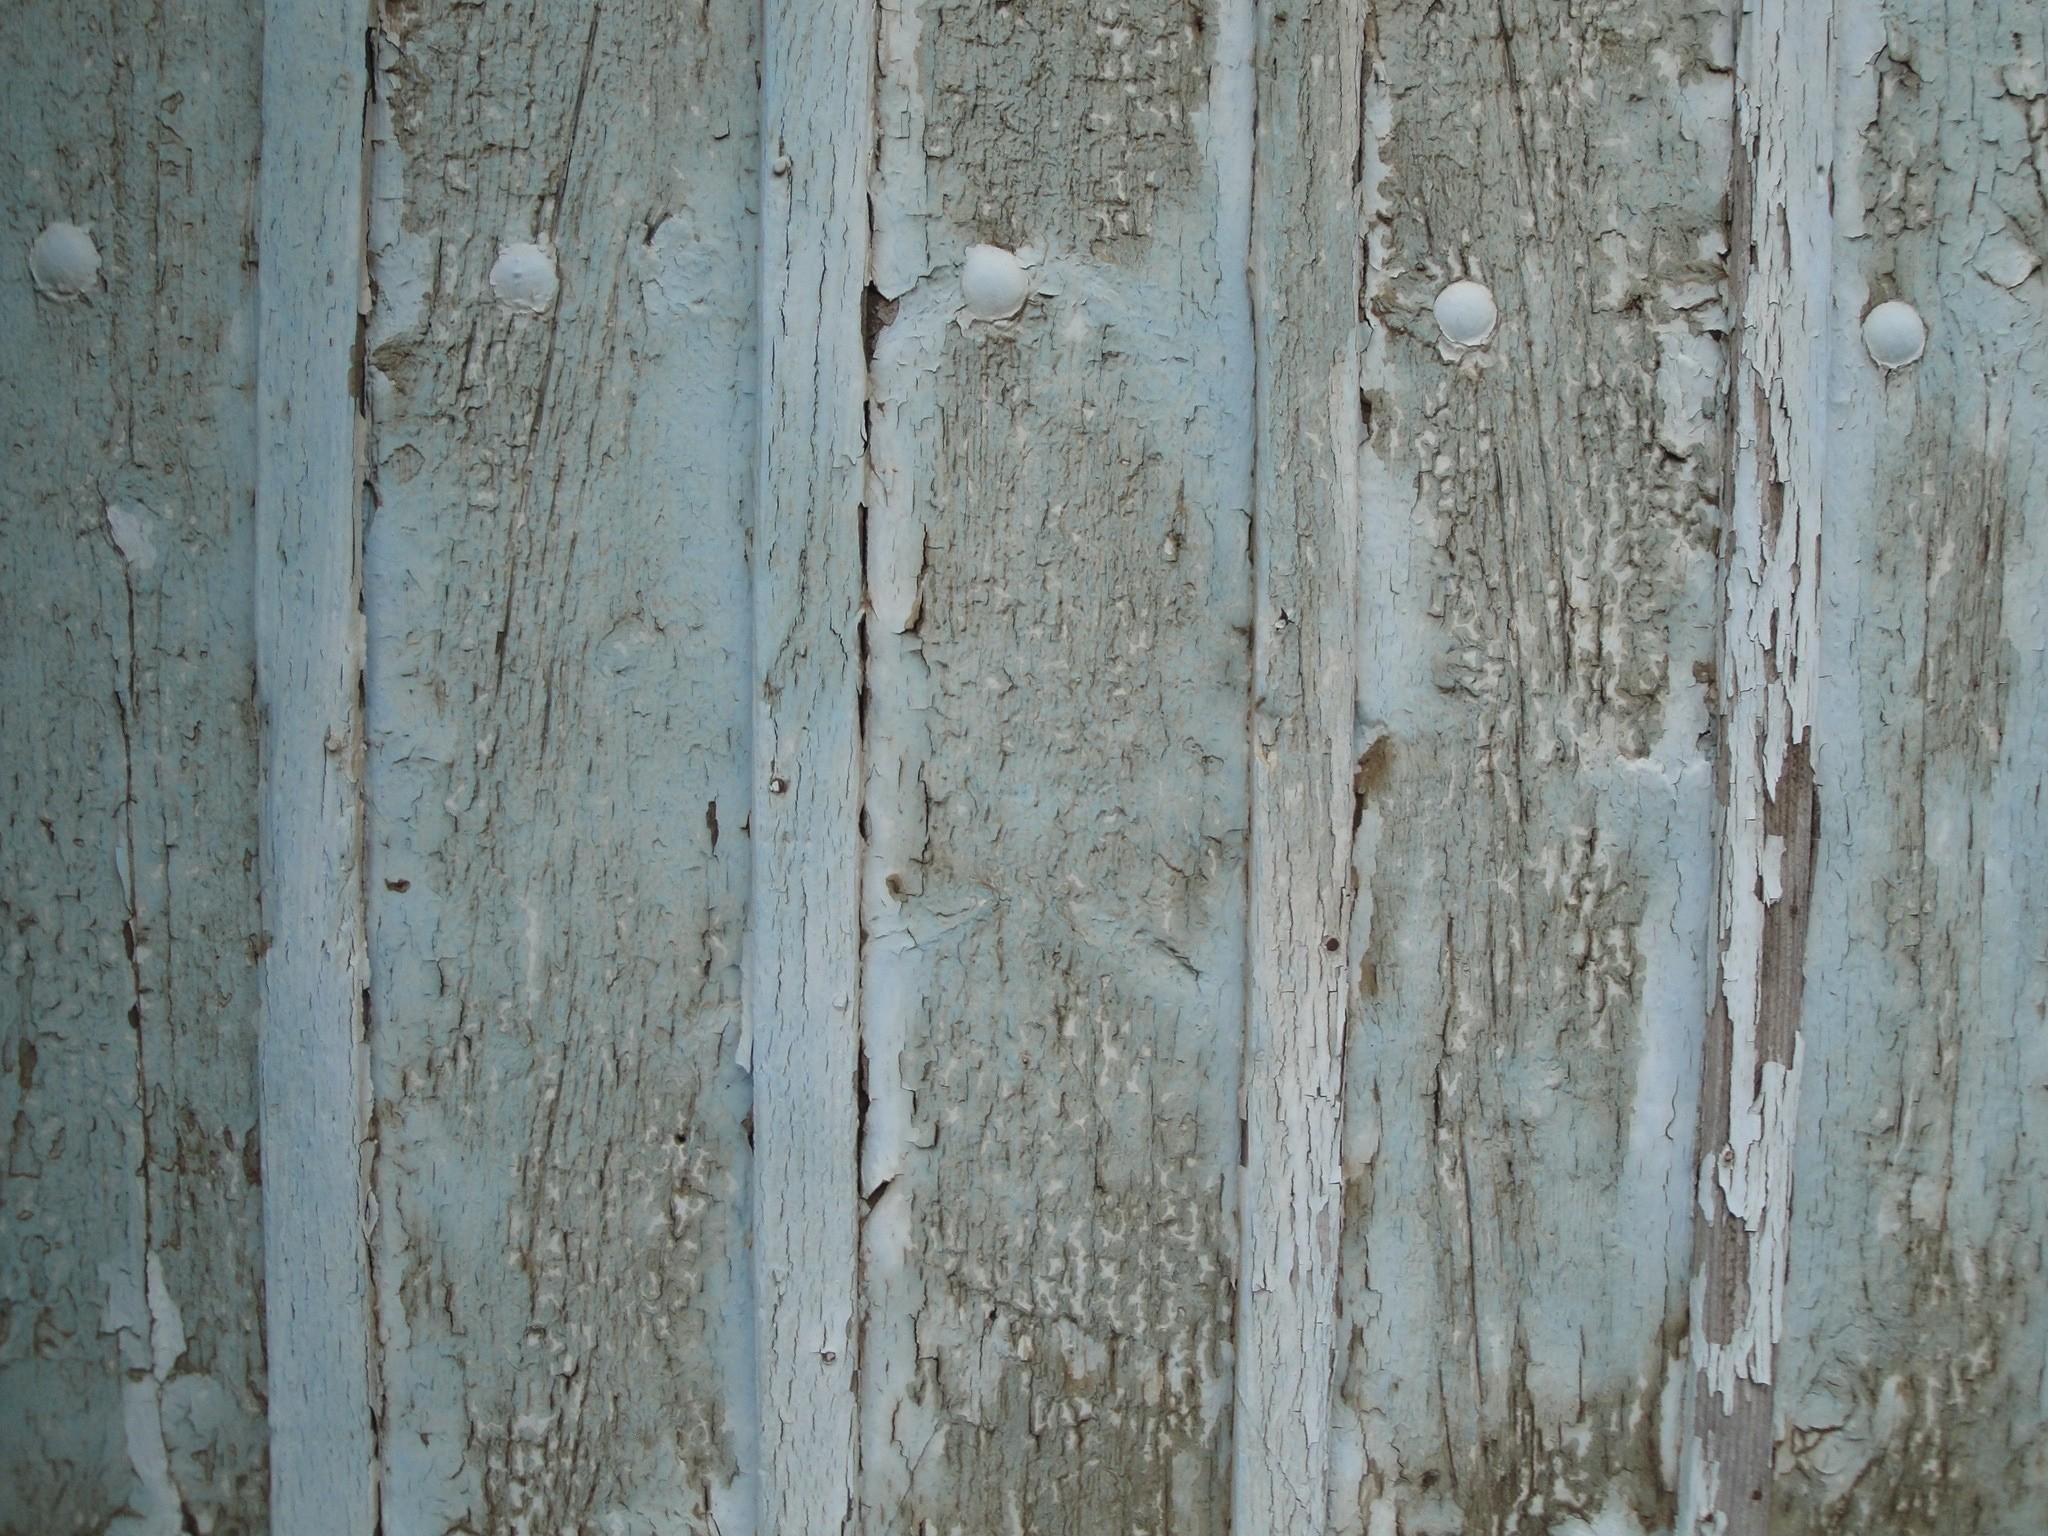 grey wooden panel.